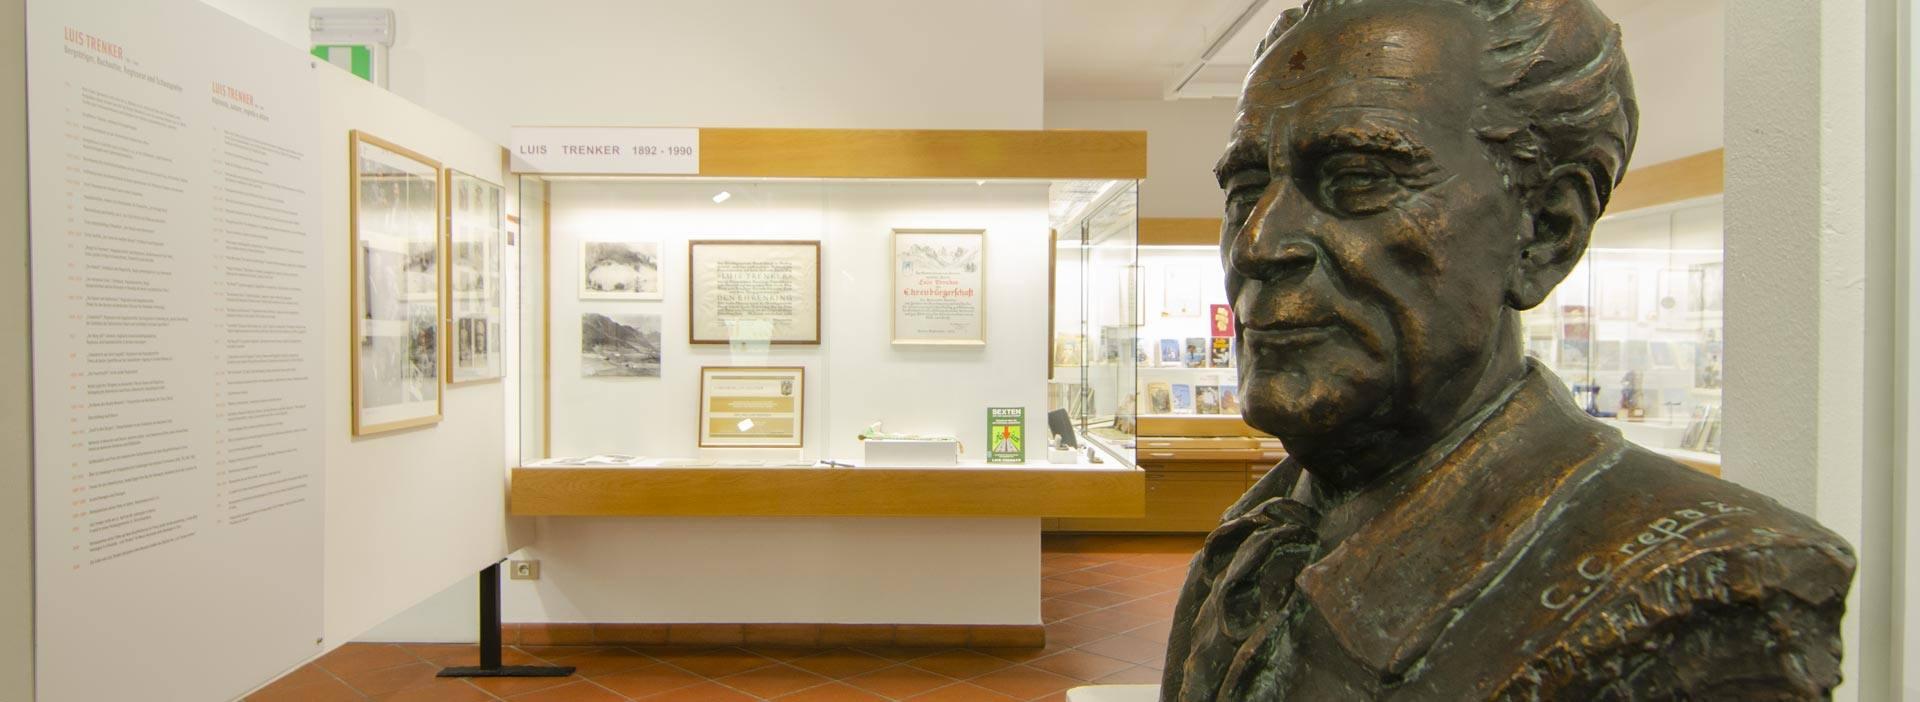 Museum Gröden - Museum Gherdëina